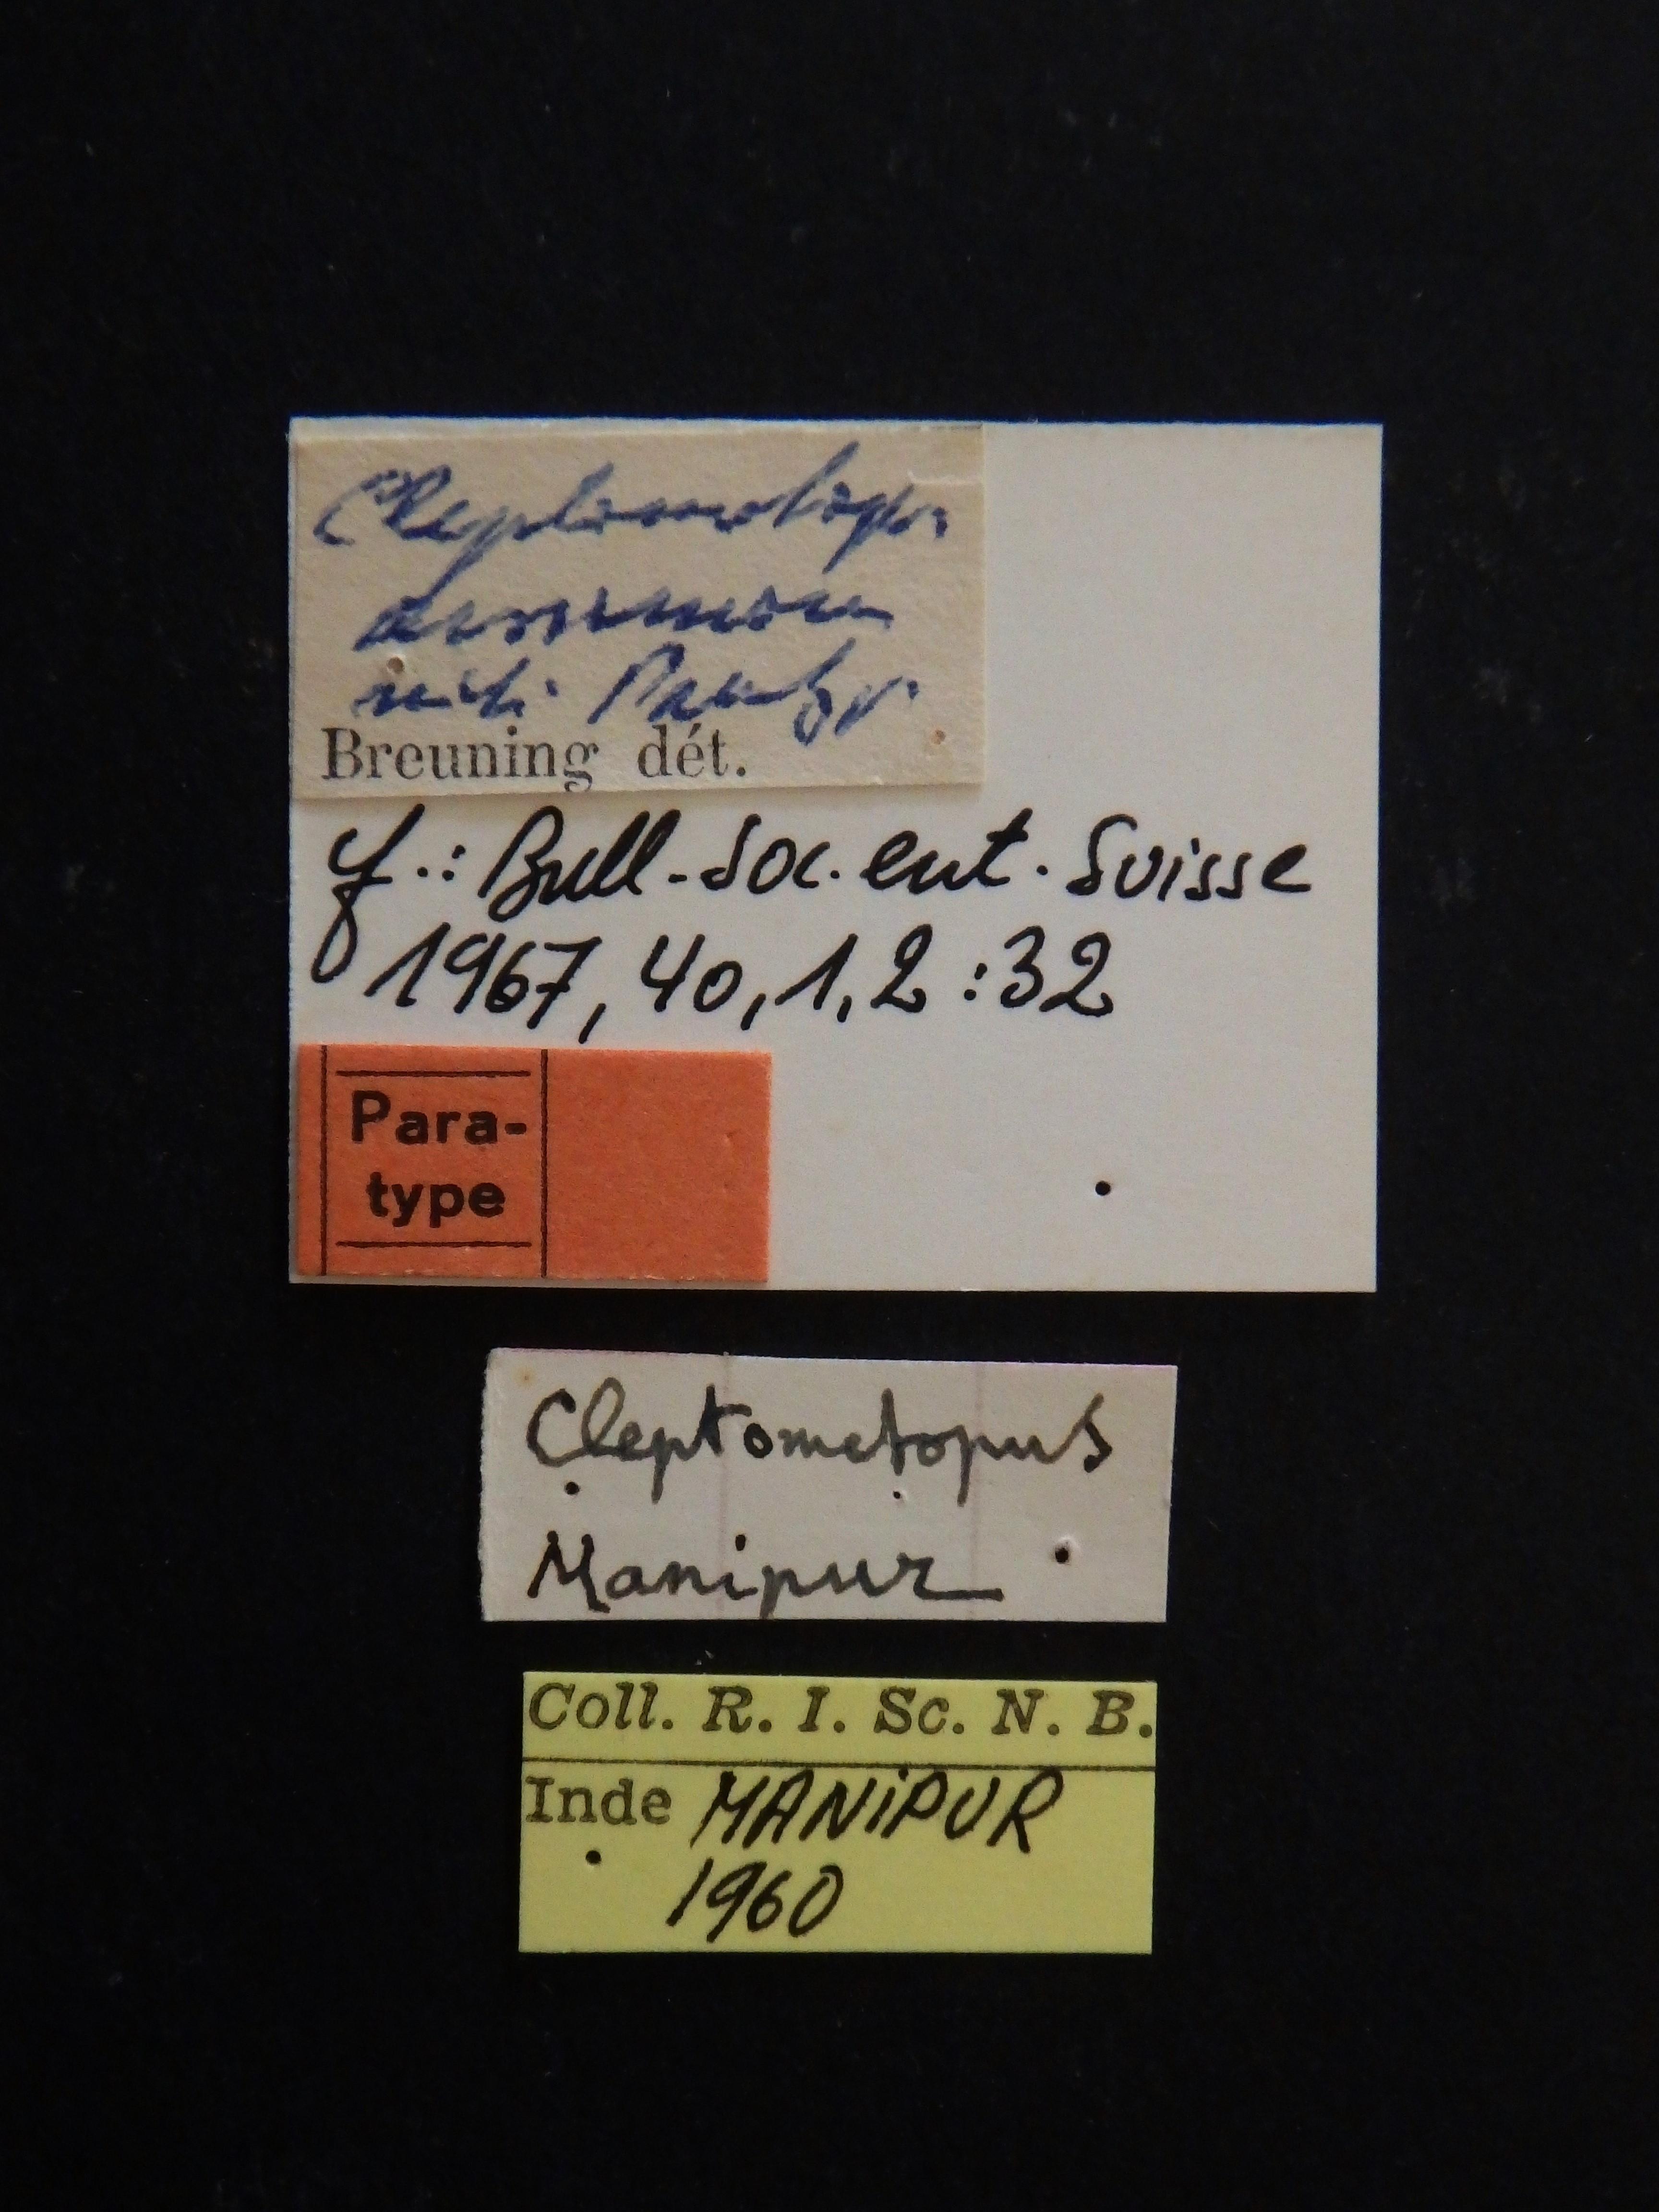 Cleptometopus assamanus pt Labels.JPG